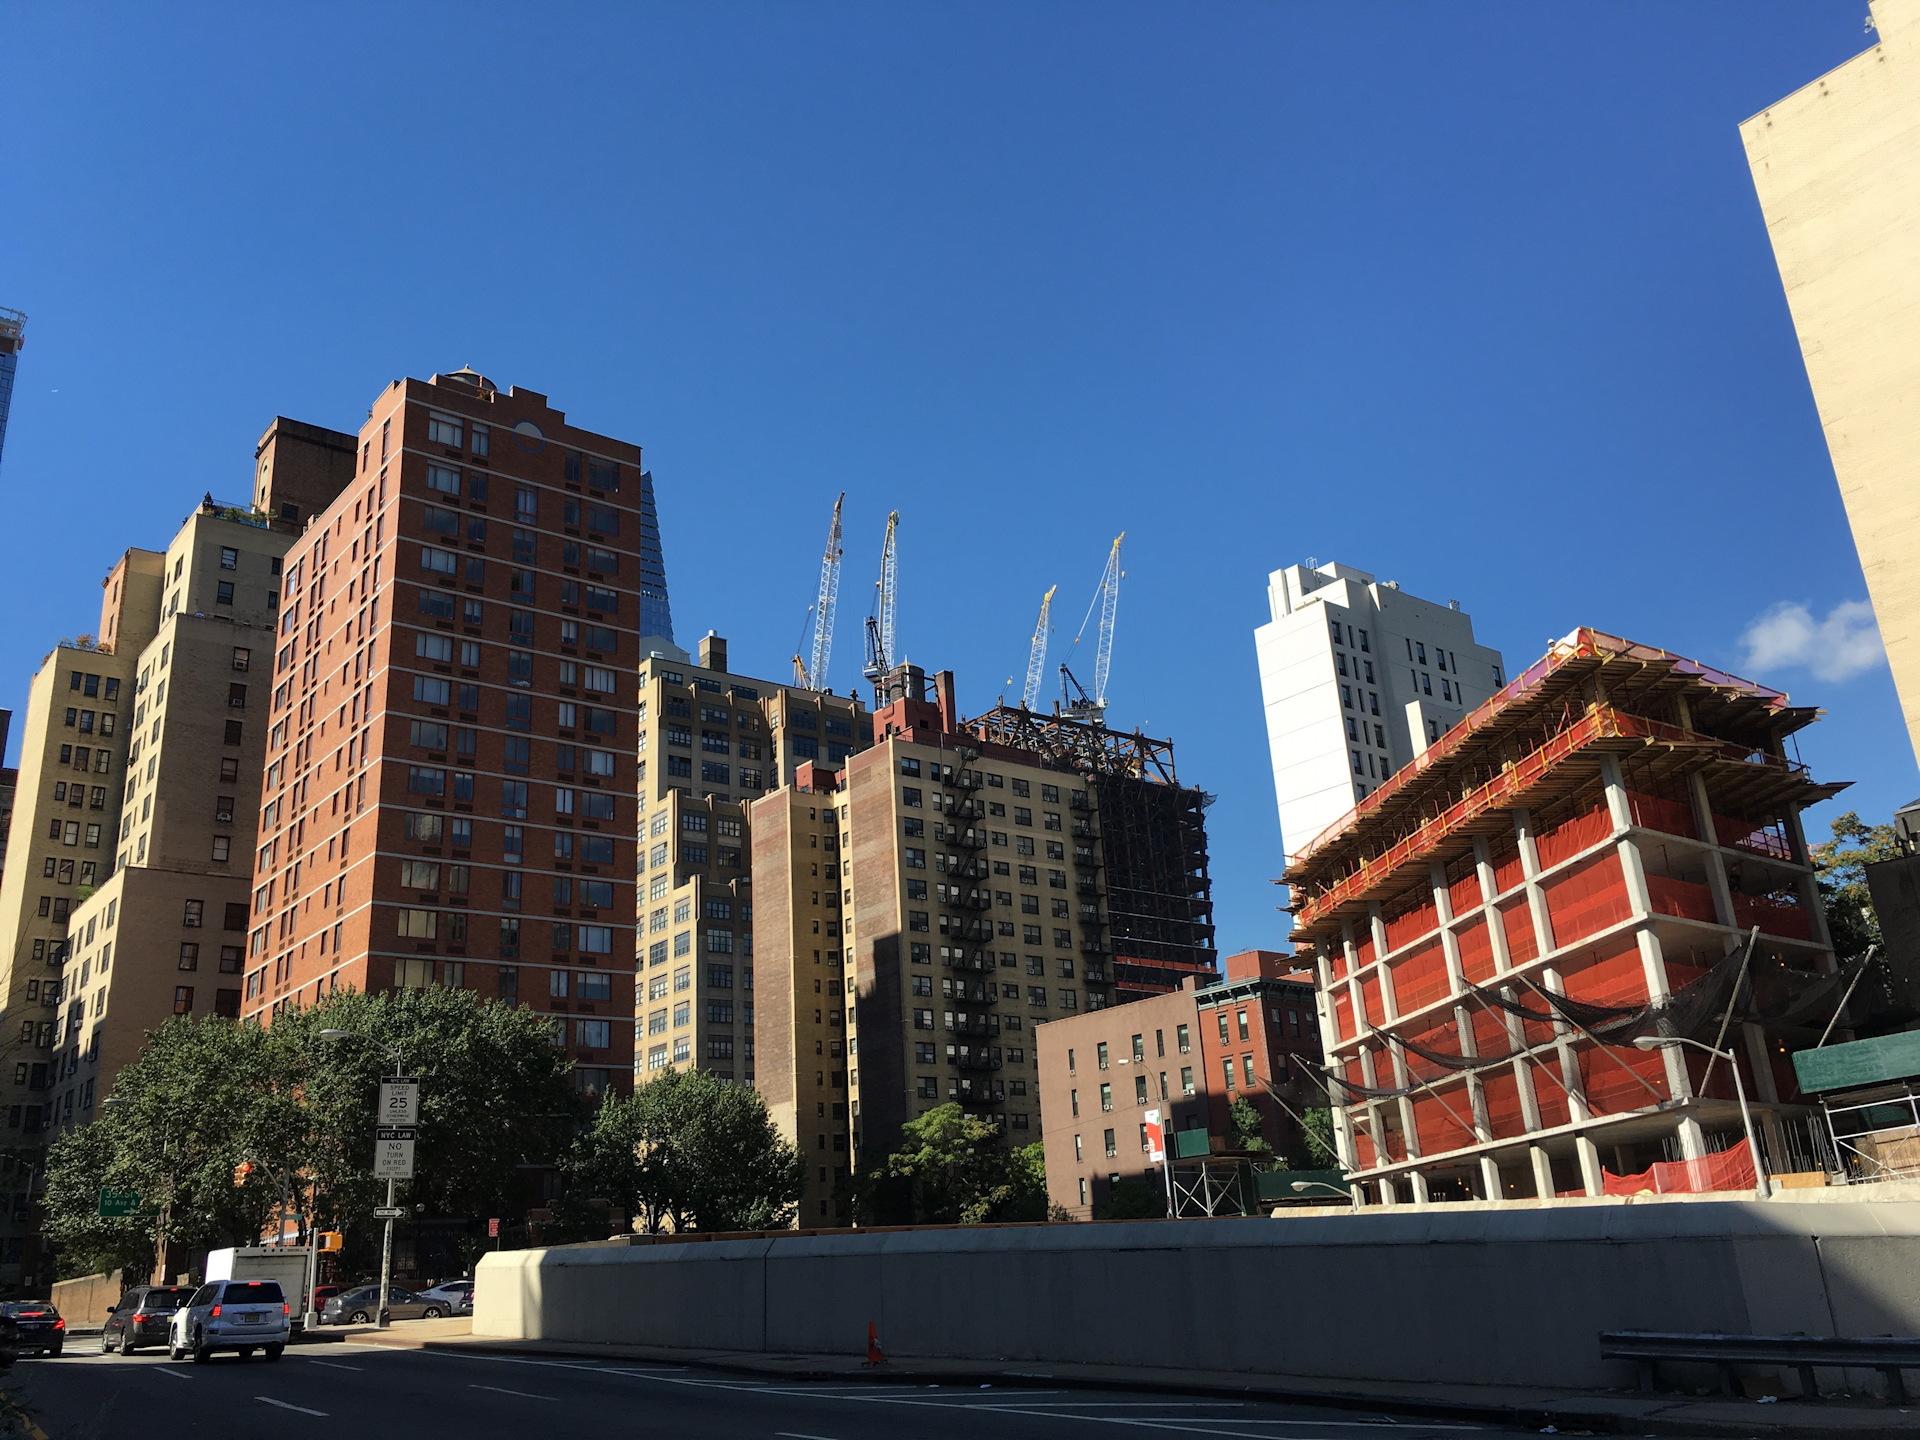 New York, NY - Flatbush Avenue Ext, September 13, 2016.jpg